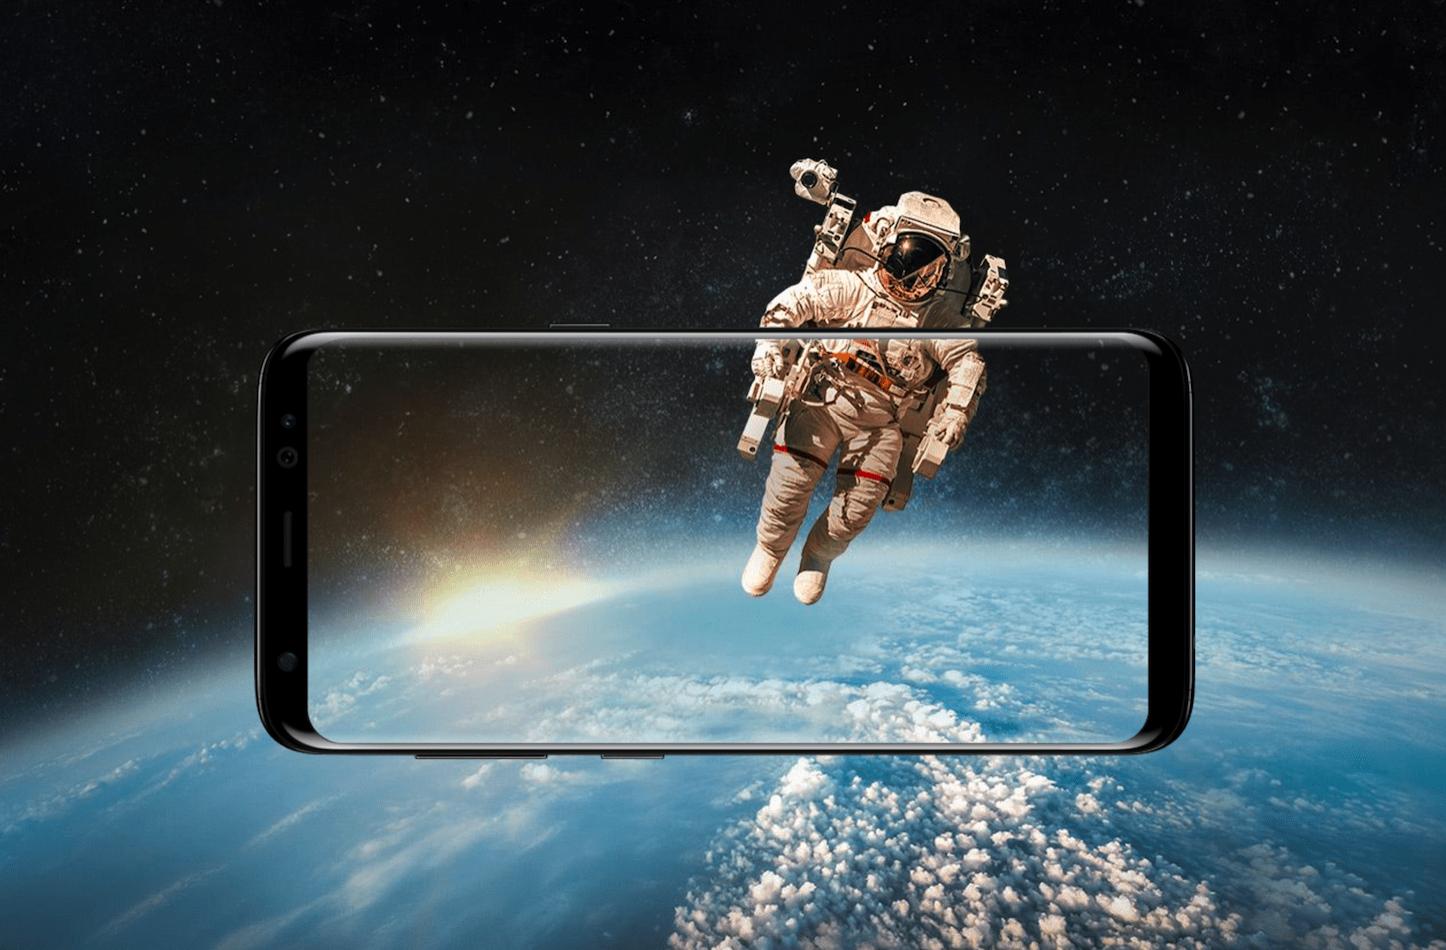 Galaxy S8 Infinity Display 2